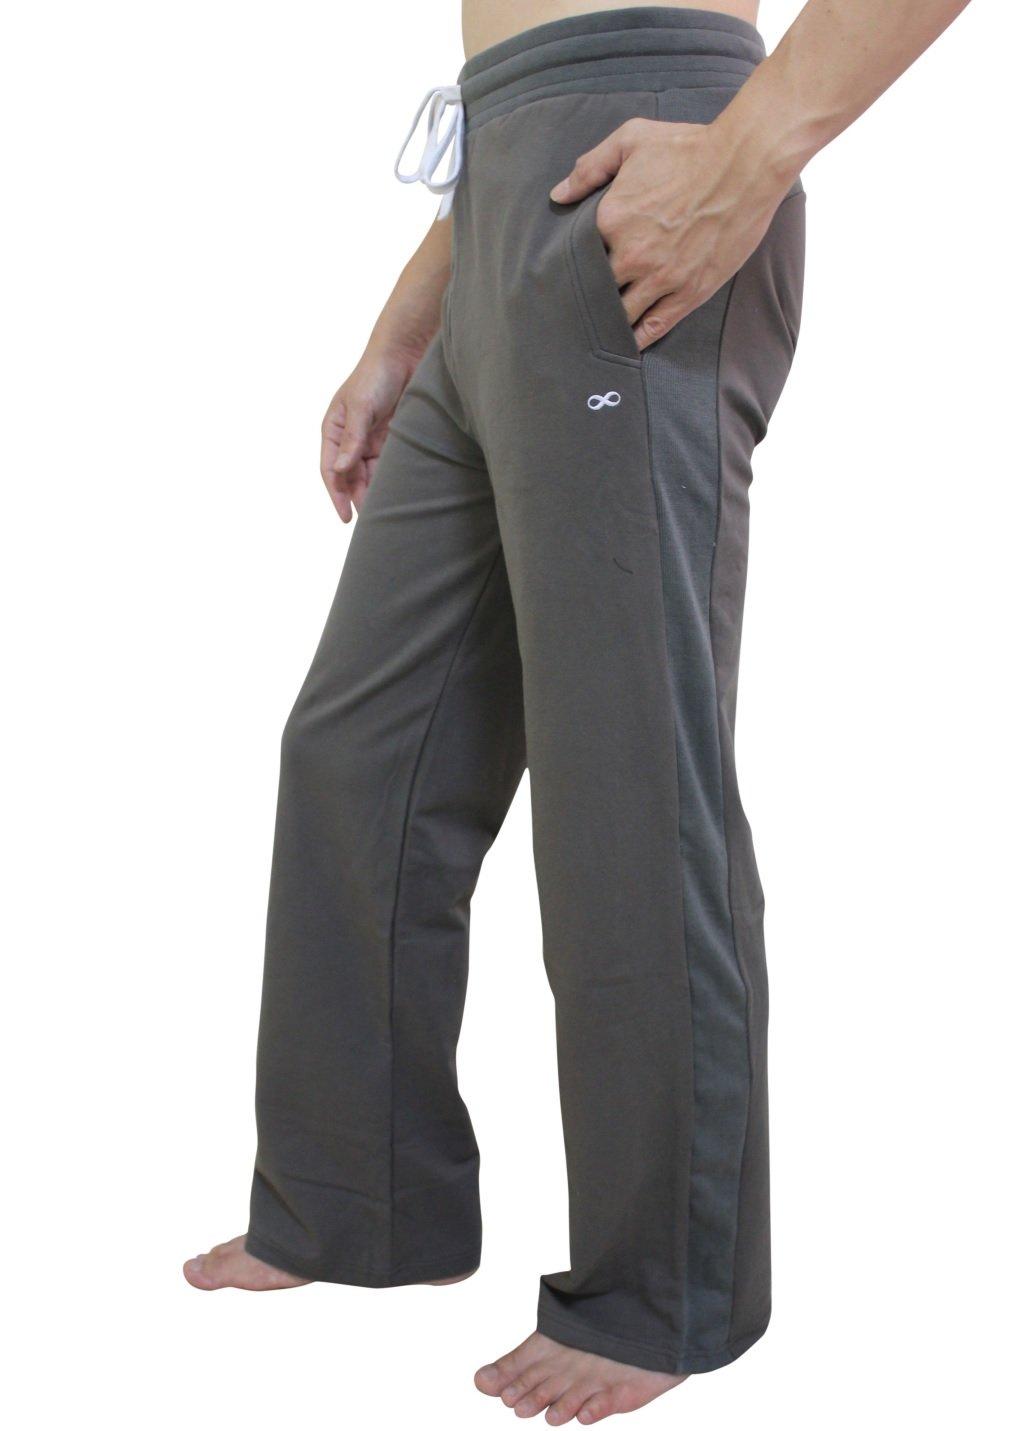 YogaAddict Men Yoga Long Pants, Pilates, Fitness, Workout, Casual, Lounge, Sleep, Martial Arts Pants, Army Green - Size L by YogaAddict